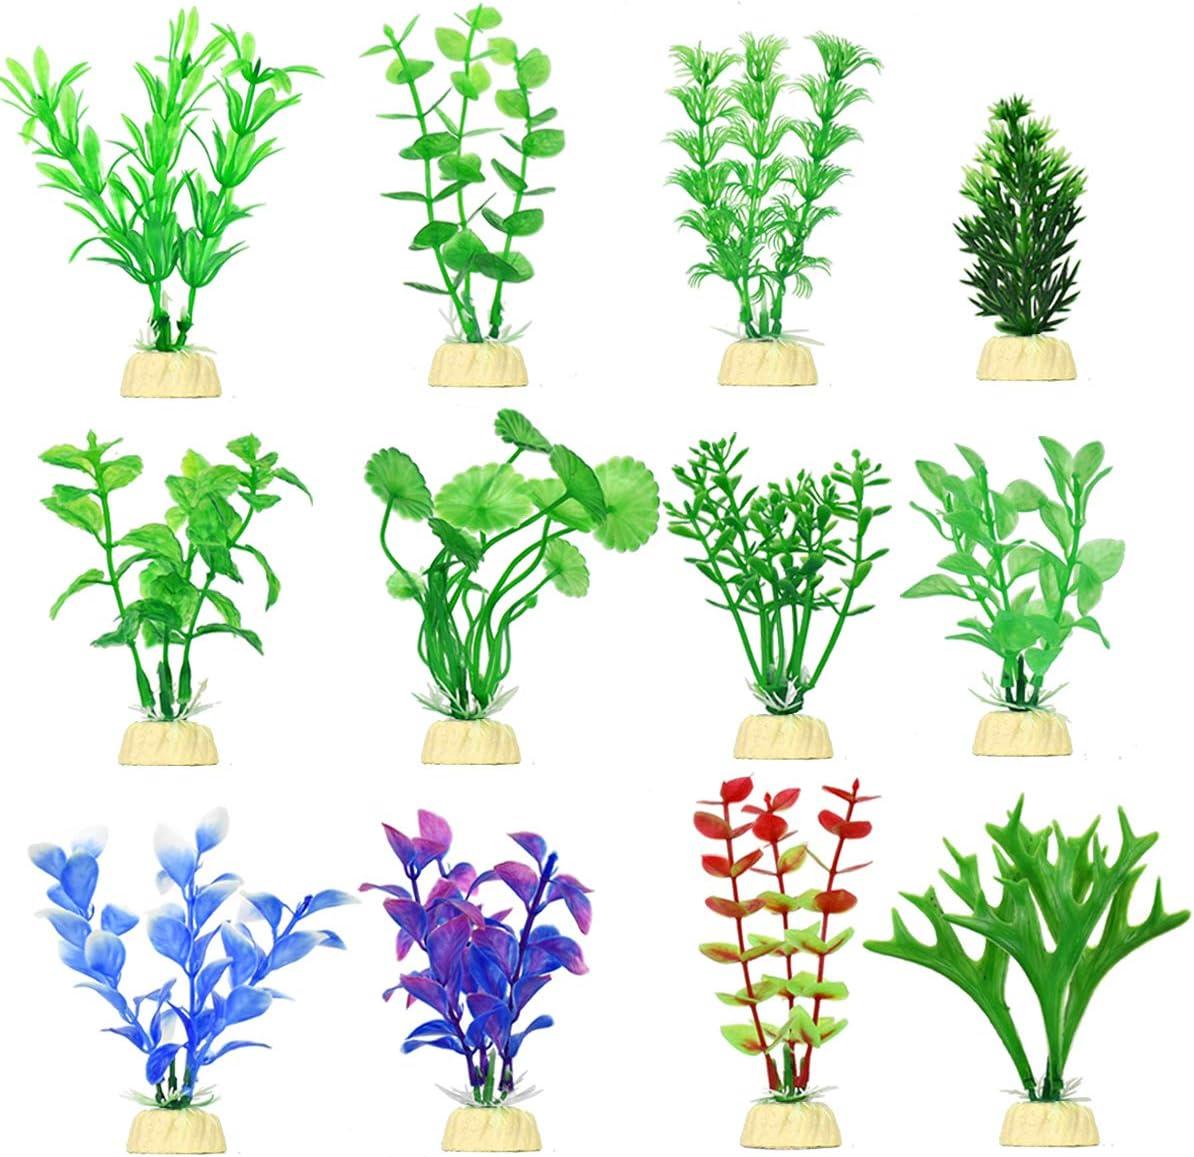 Artificial Aquarium Plants Set, Plastic Fish Tank Decoration, 12 Pack, Non-Toxic&Soft, Safe for Fish (A)